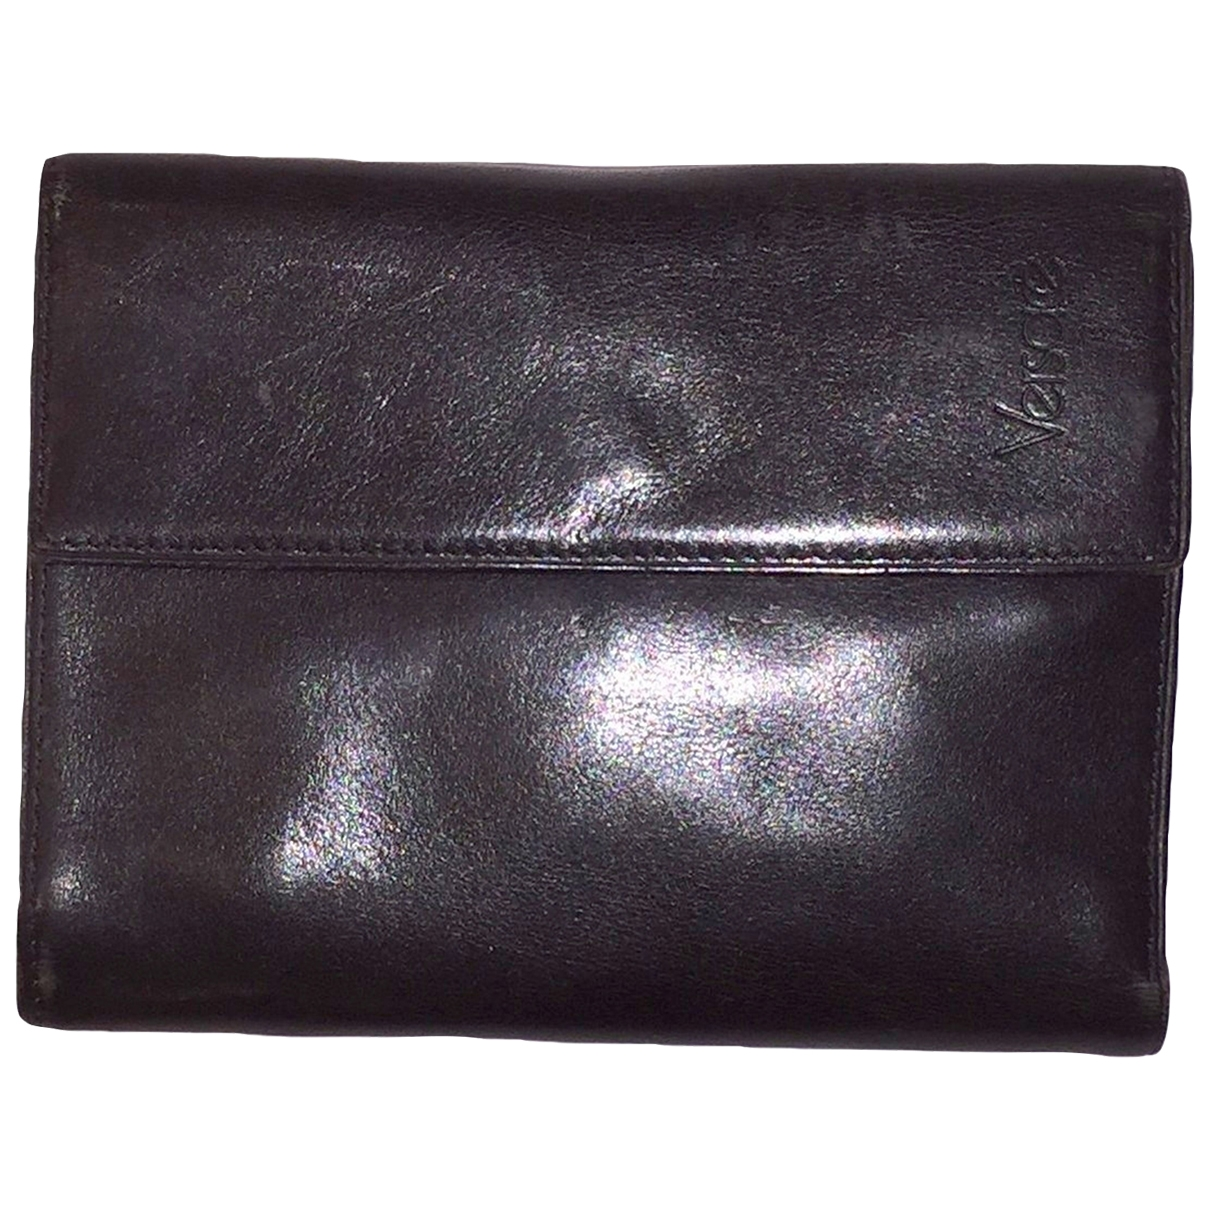 Gianni Versace \N Black Leather wallet for Women \N